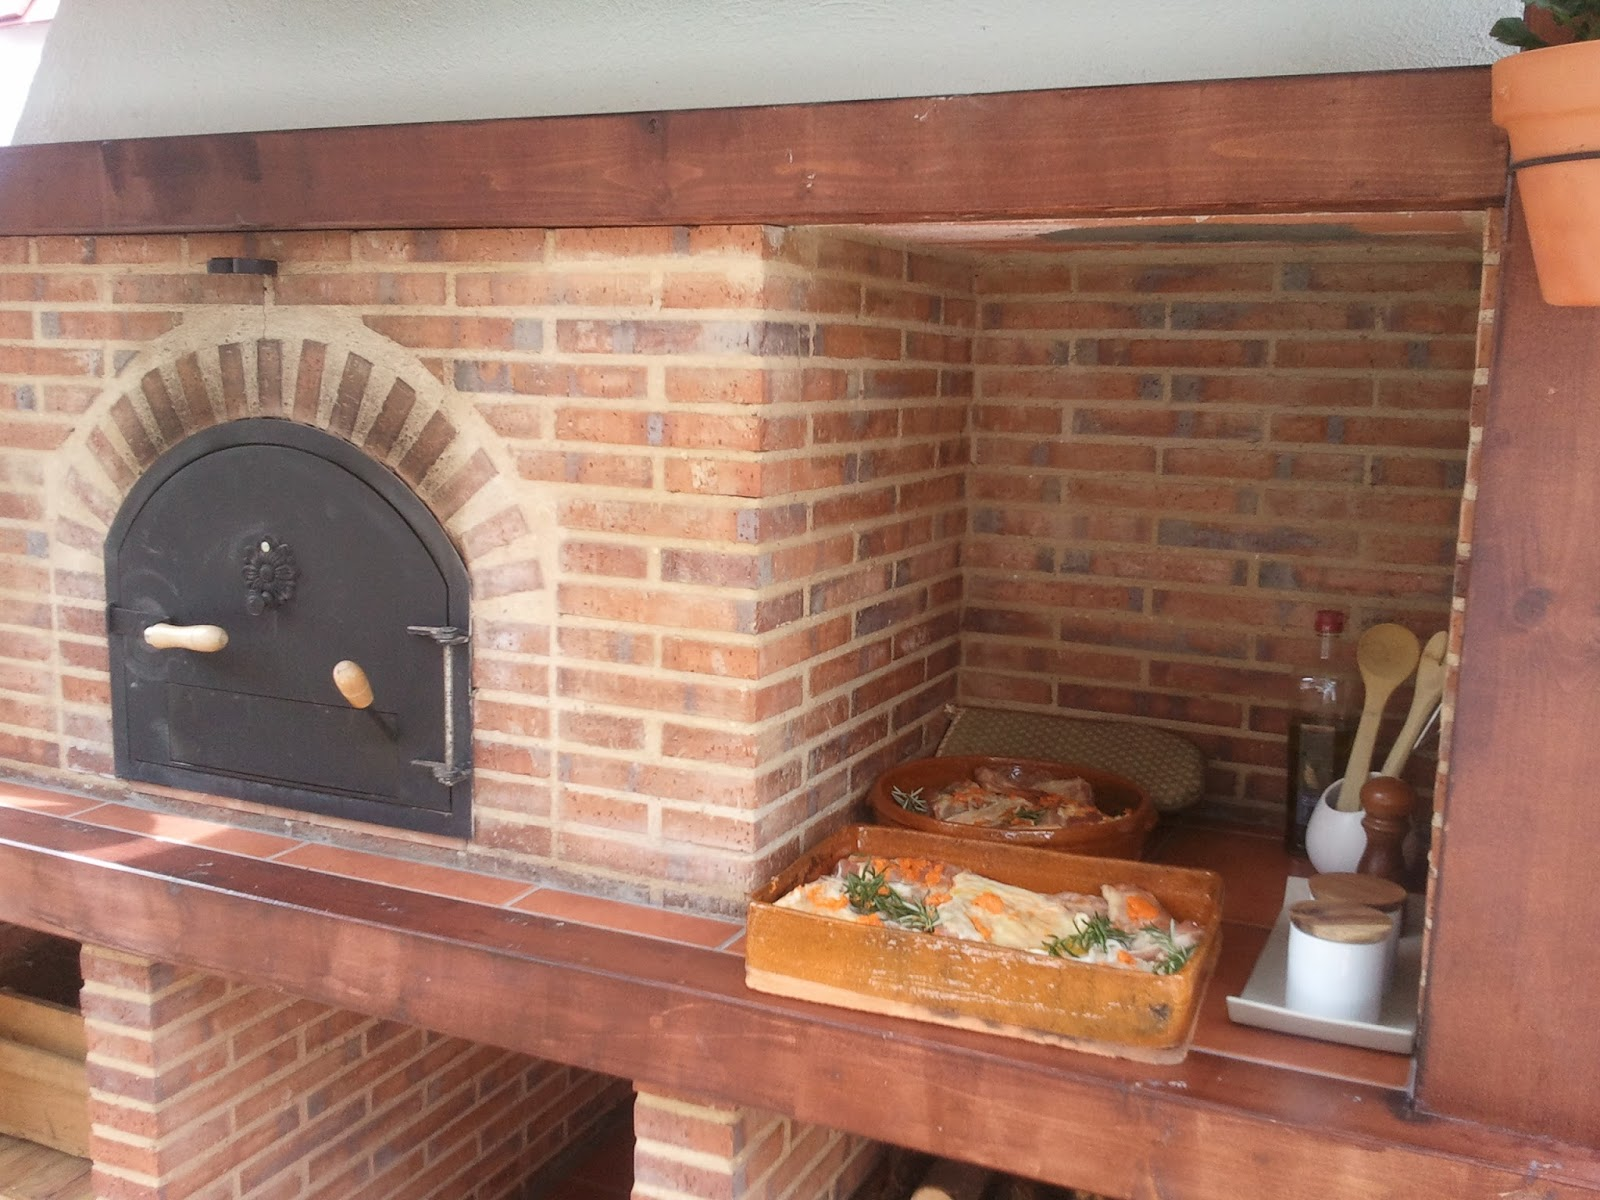 La fabrica de pereruela horno de cesar arroyo - Construir horno de lena ...